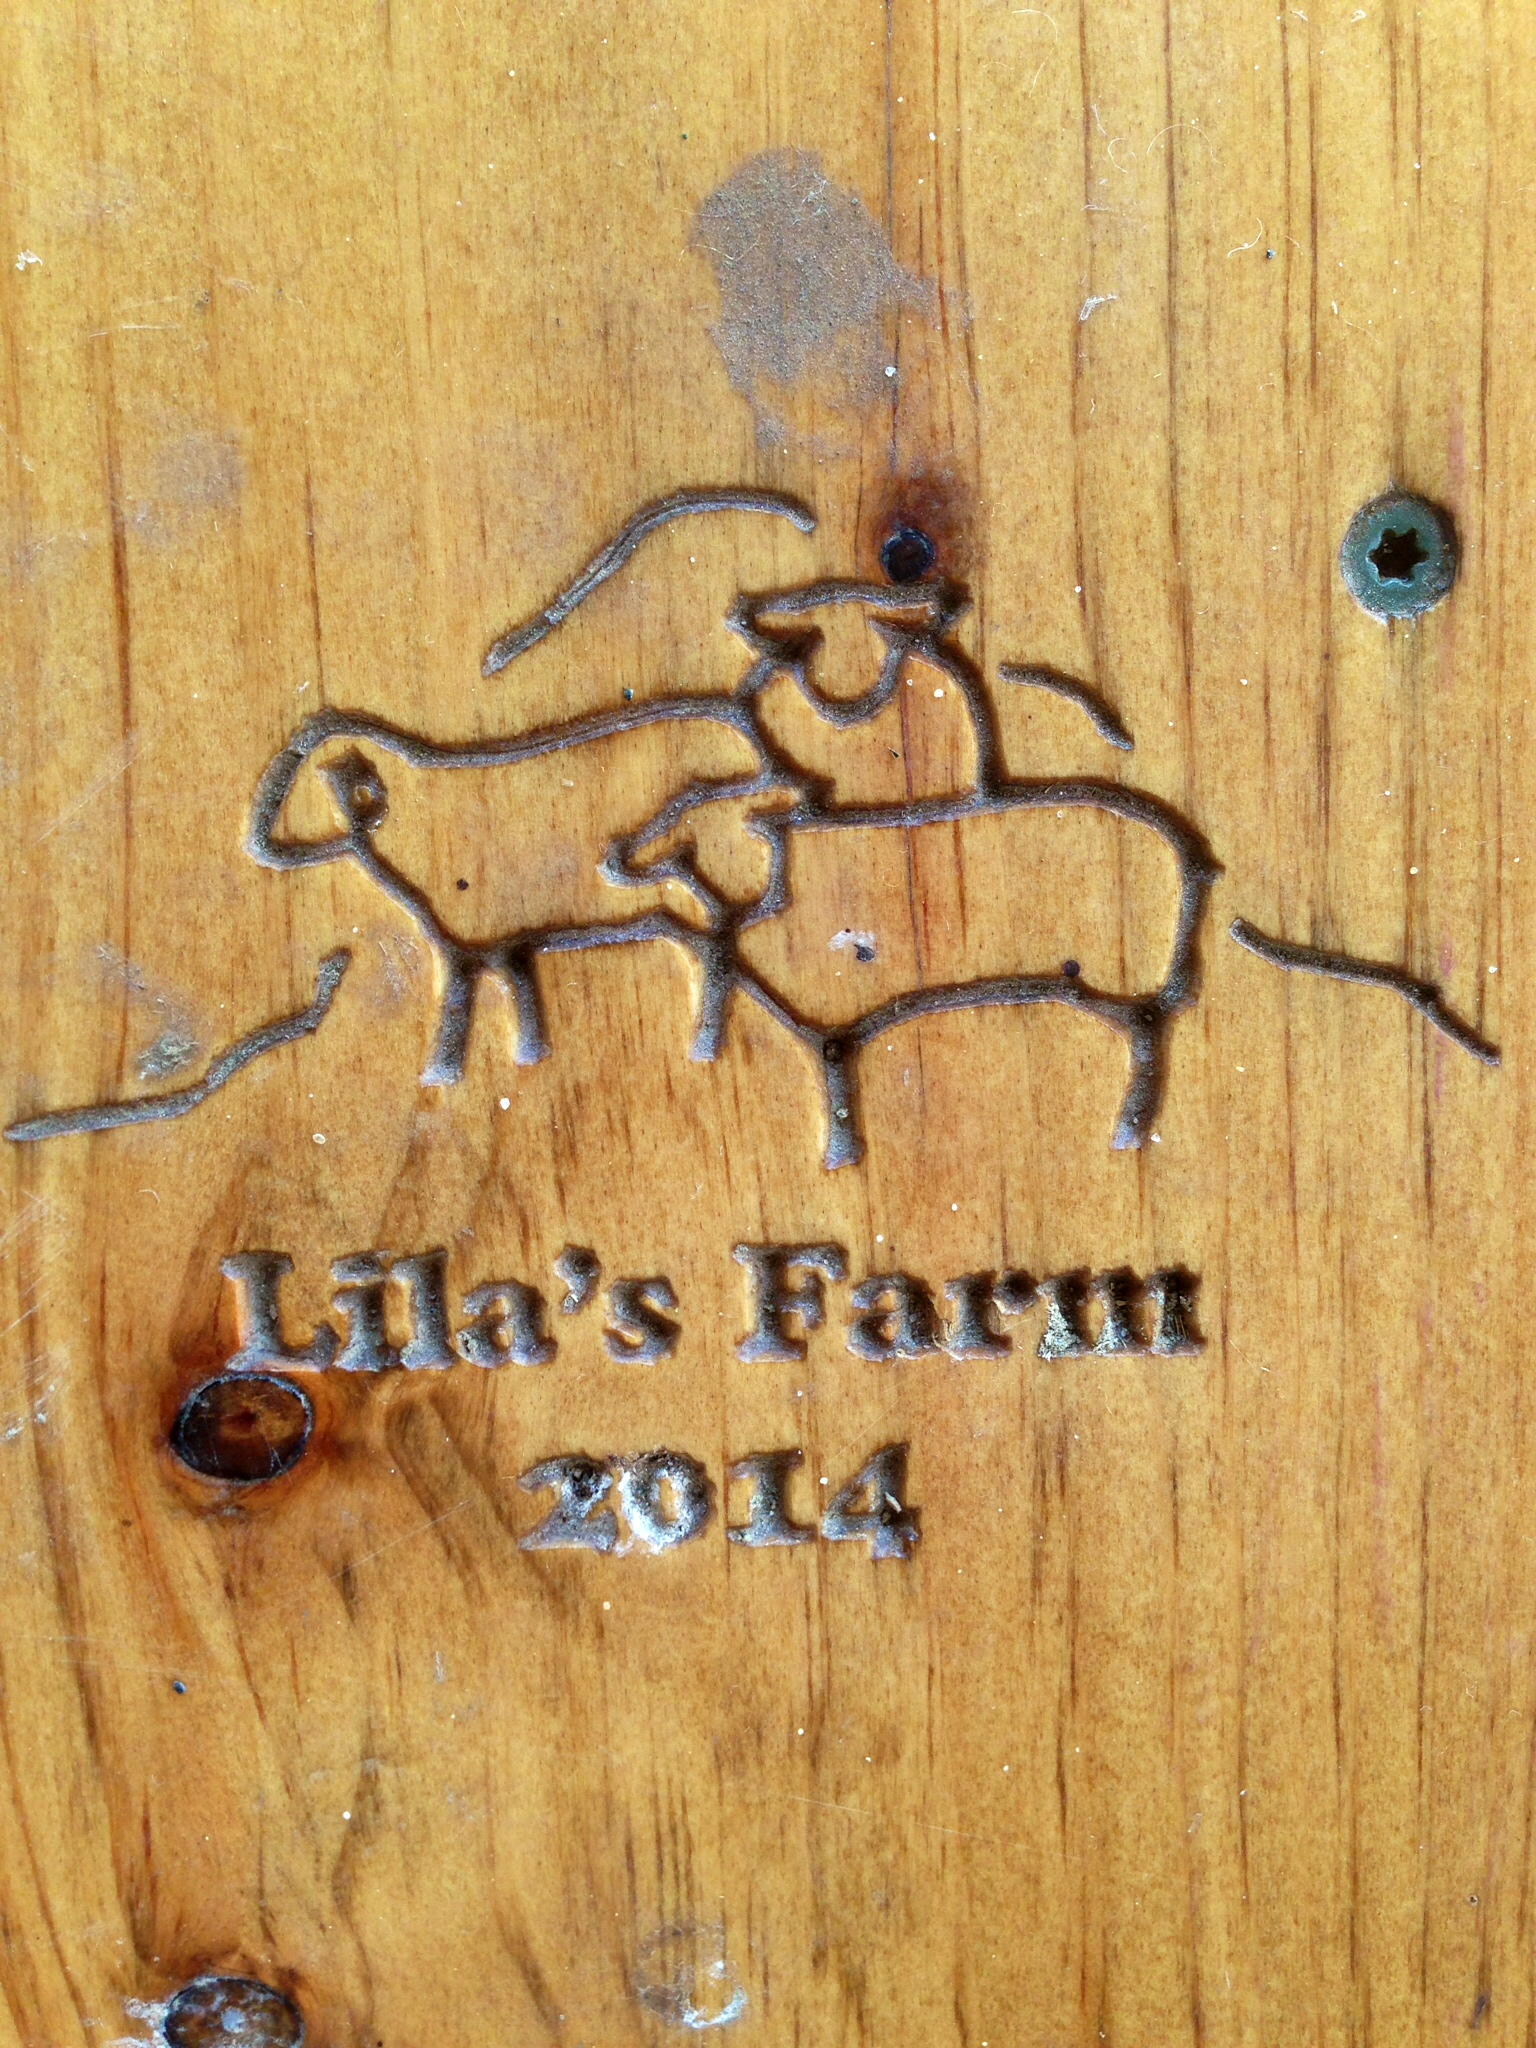 Lila's Brand-Great Barrington New York